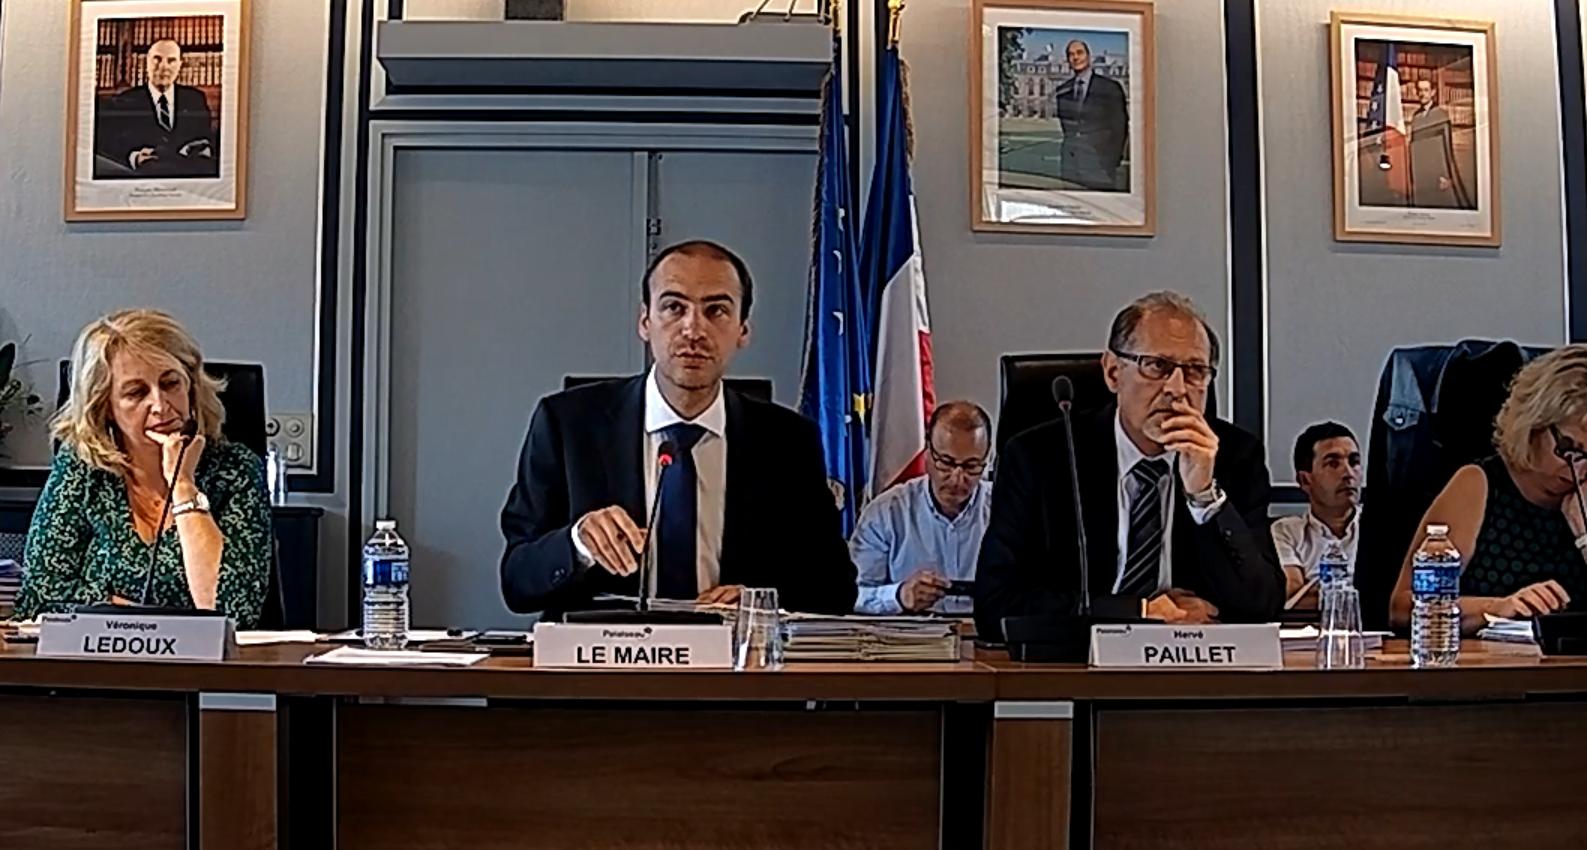 Mairie de PALAISEAU - Conseil Municipal du 25 juin 2018